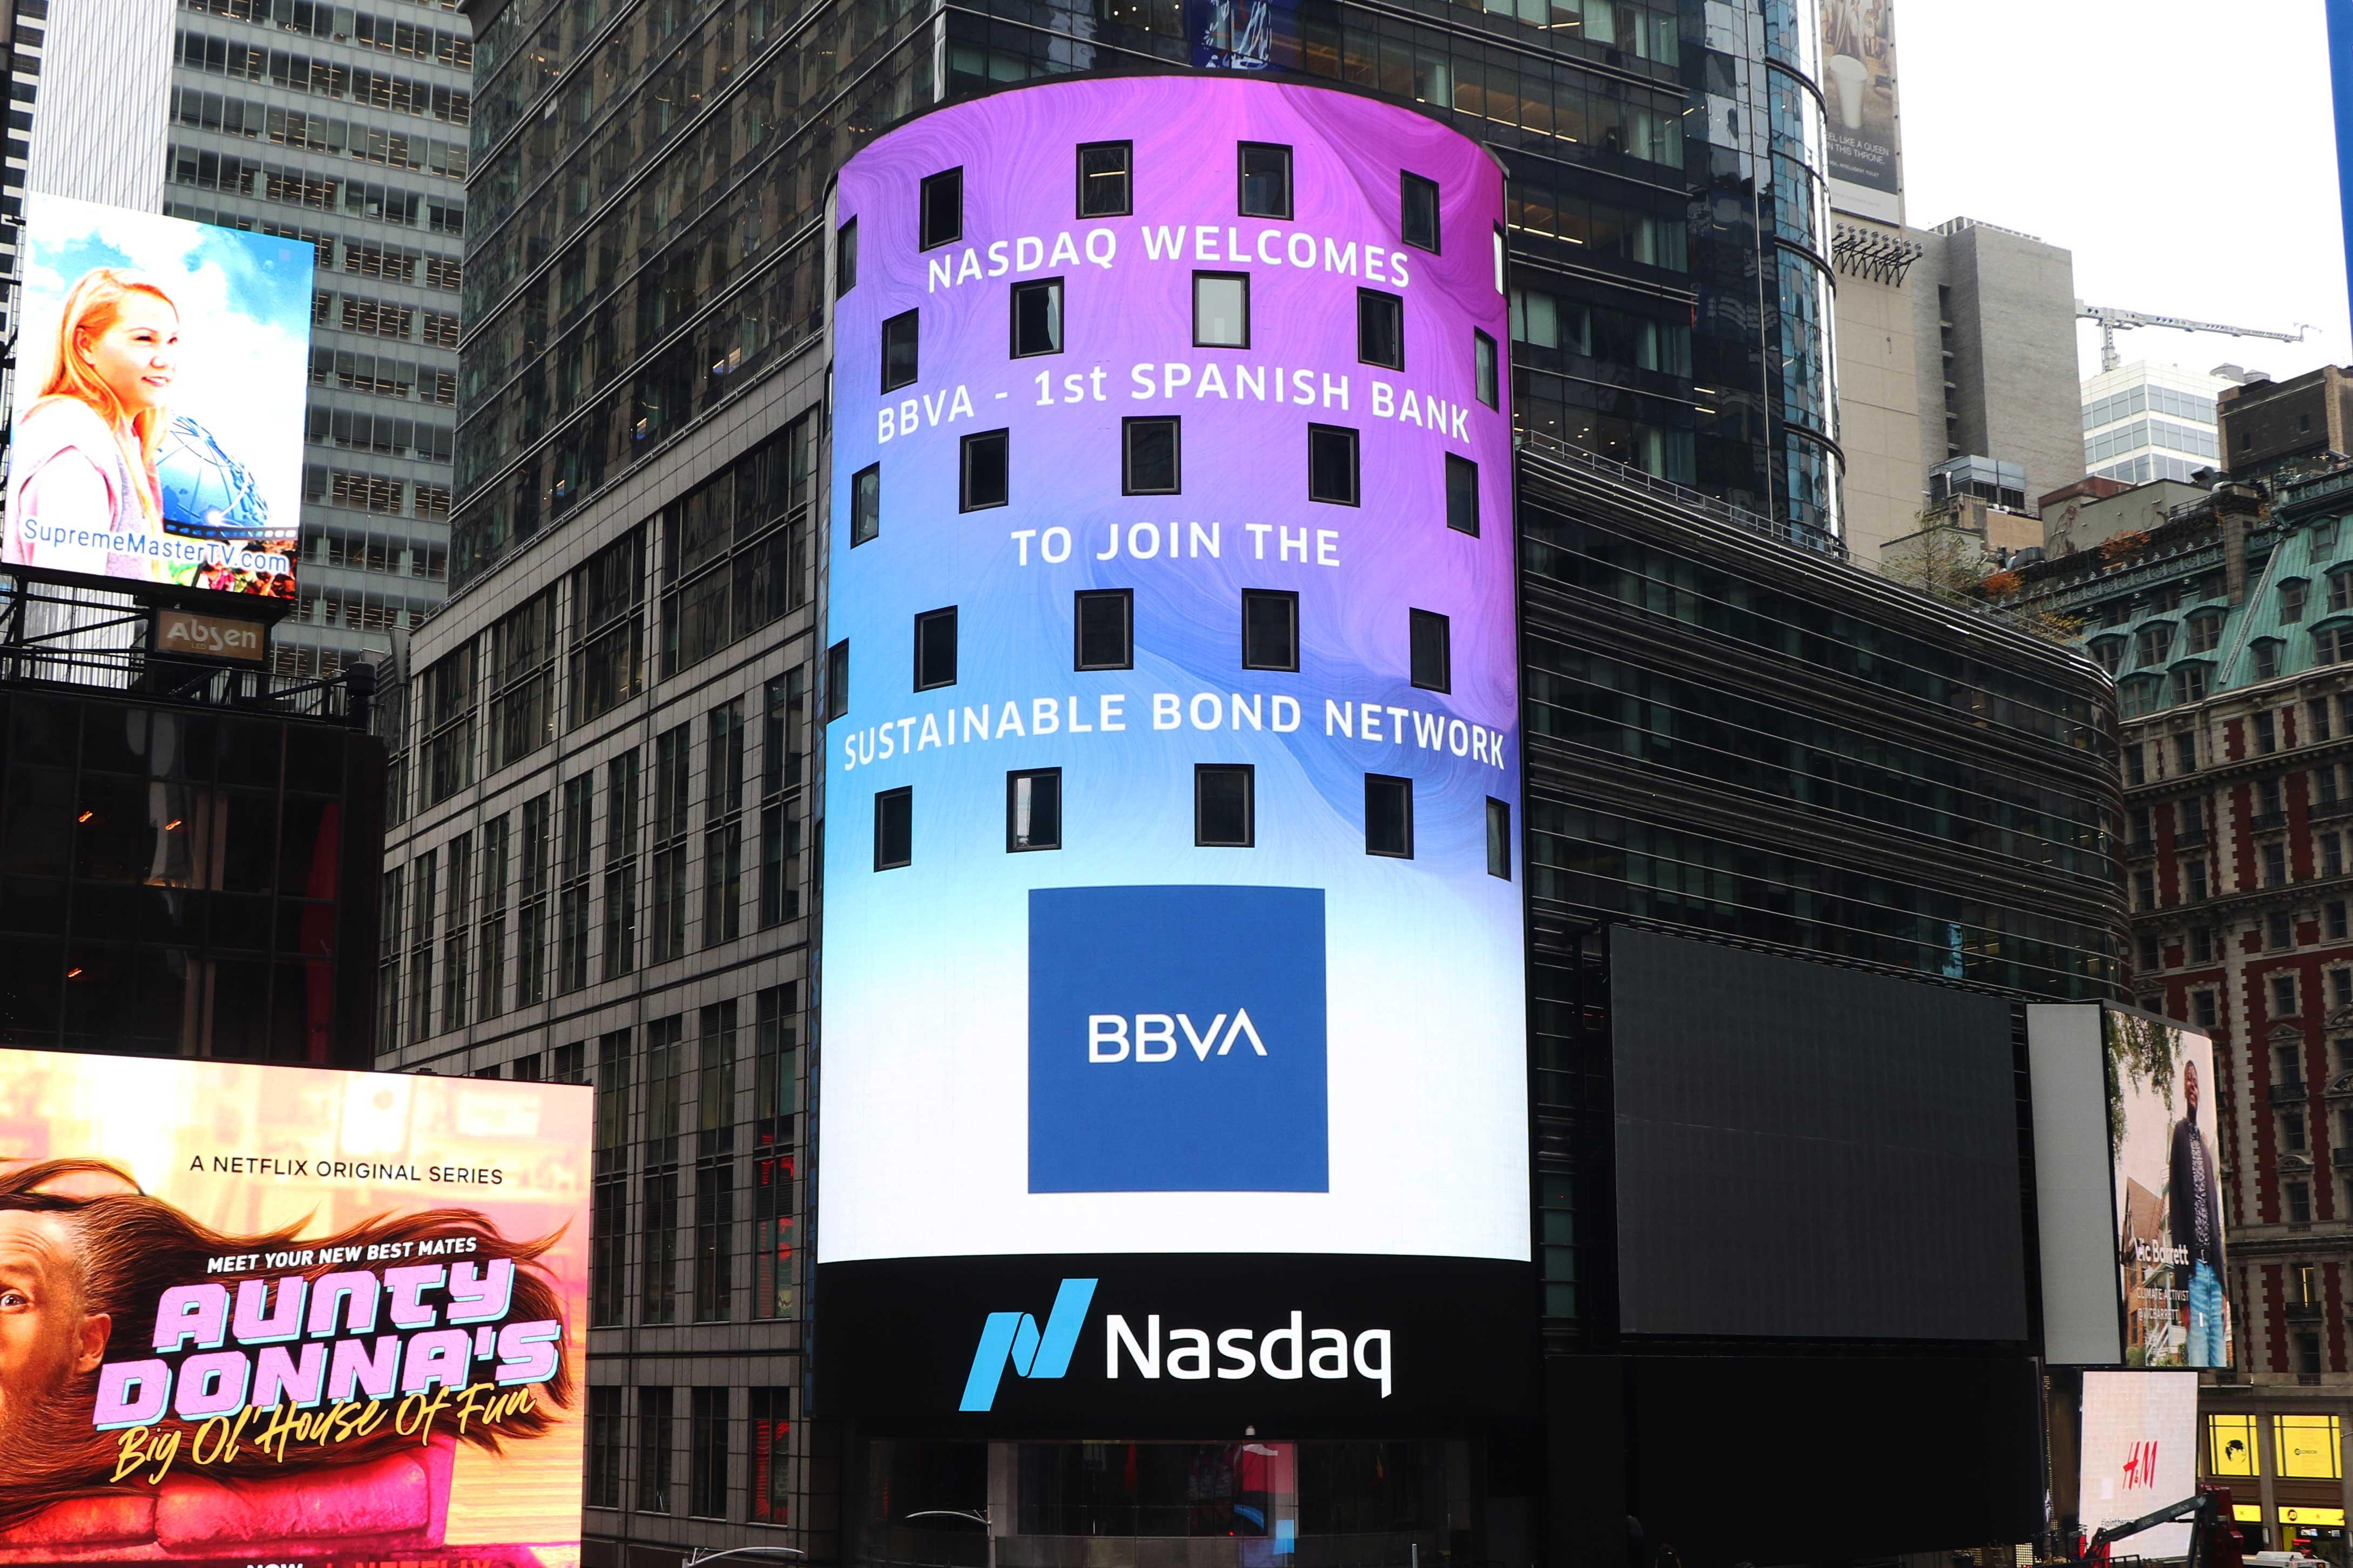 NASDAQ - BBVA